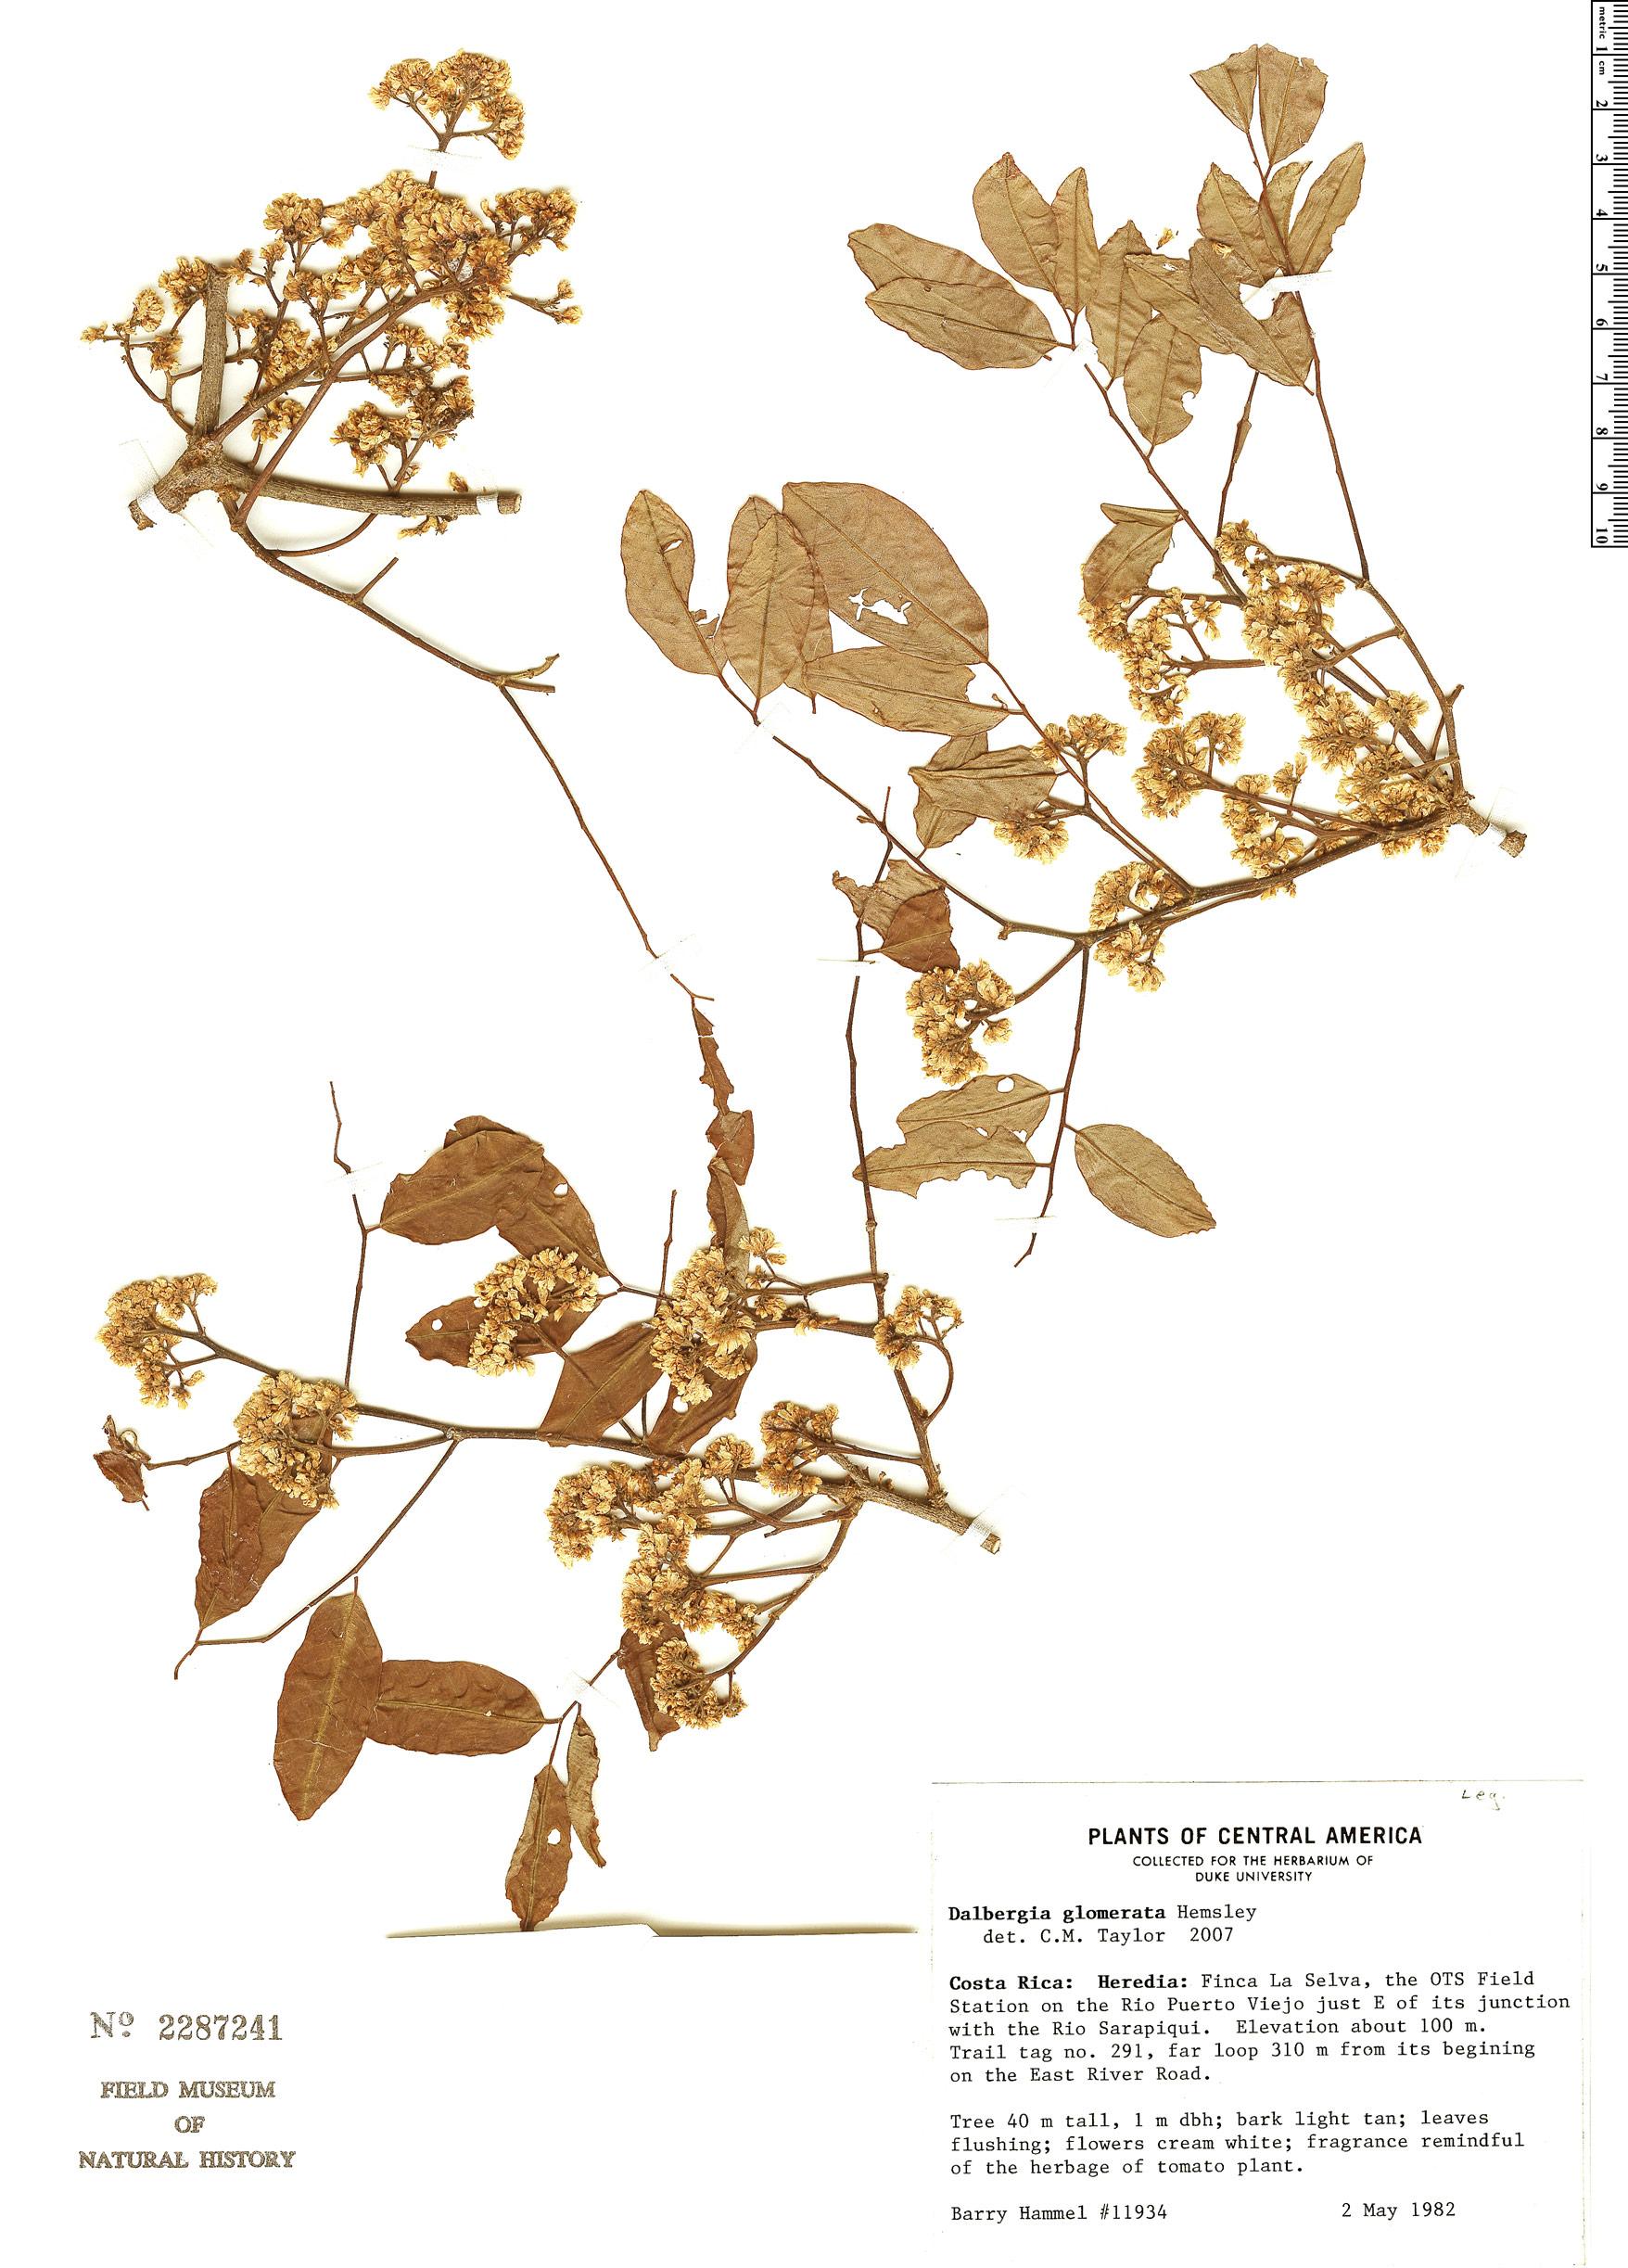 Specimen: Dalbergia glomerata